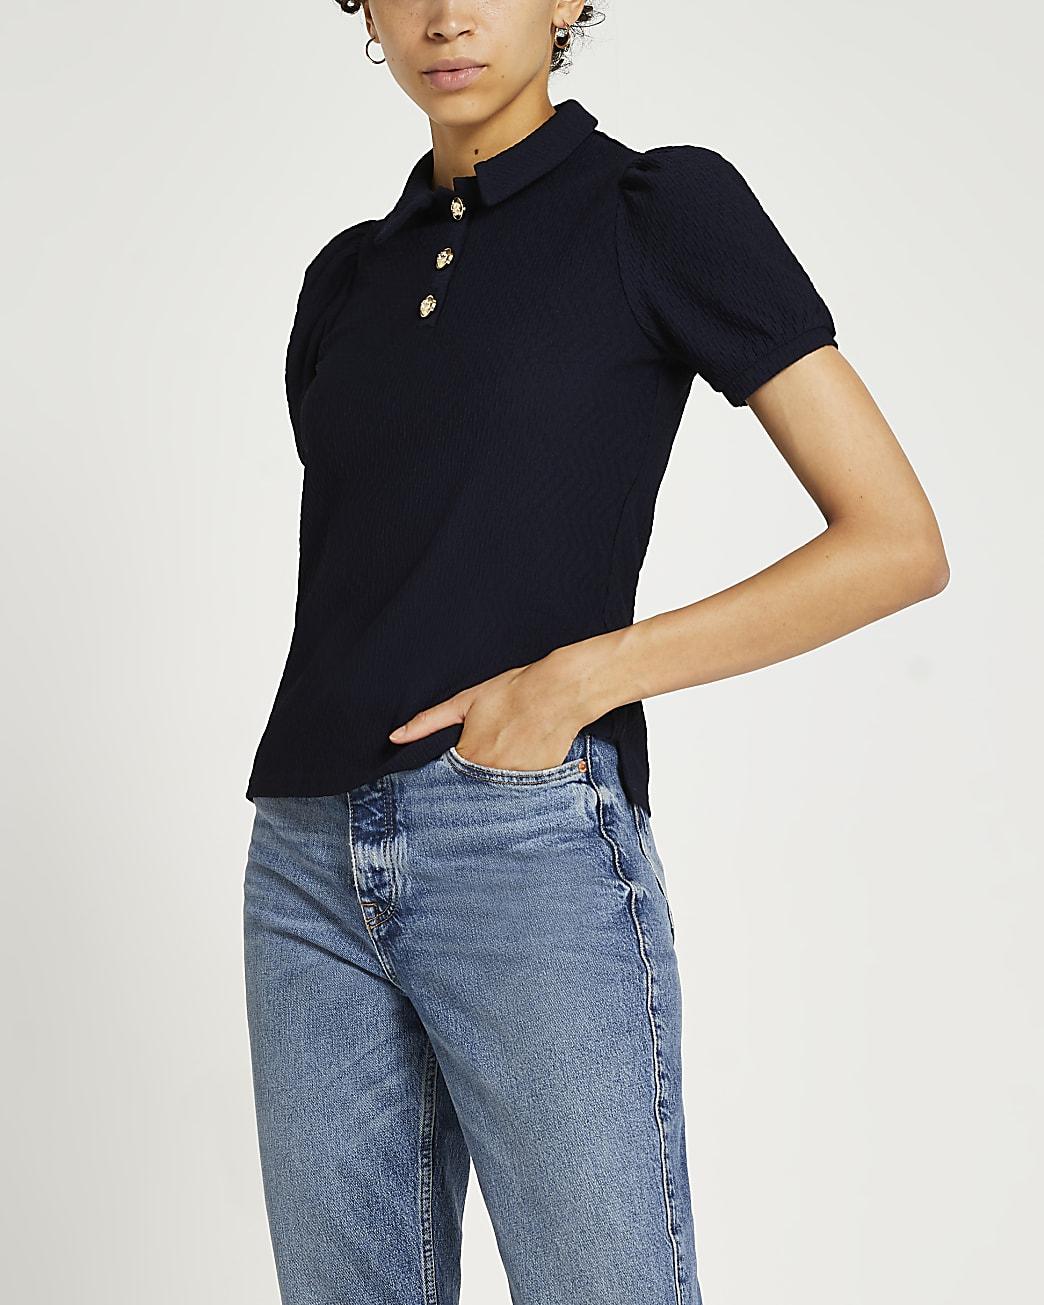 Navy puff sleeve textured polo shirt